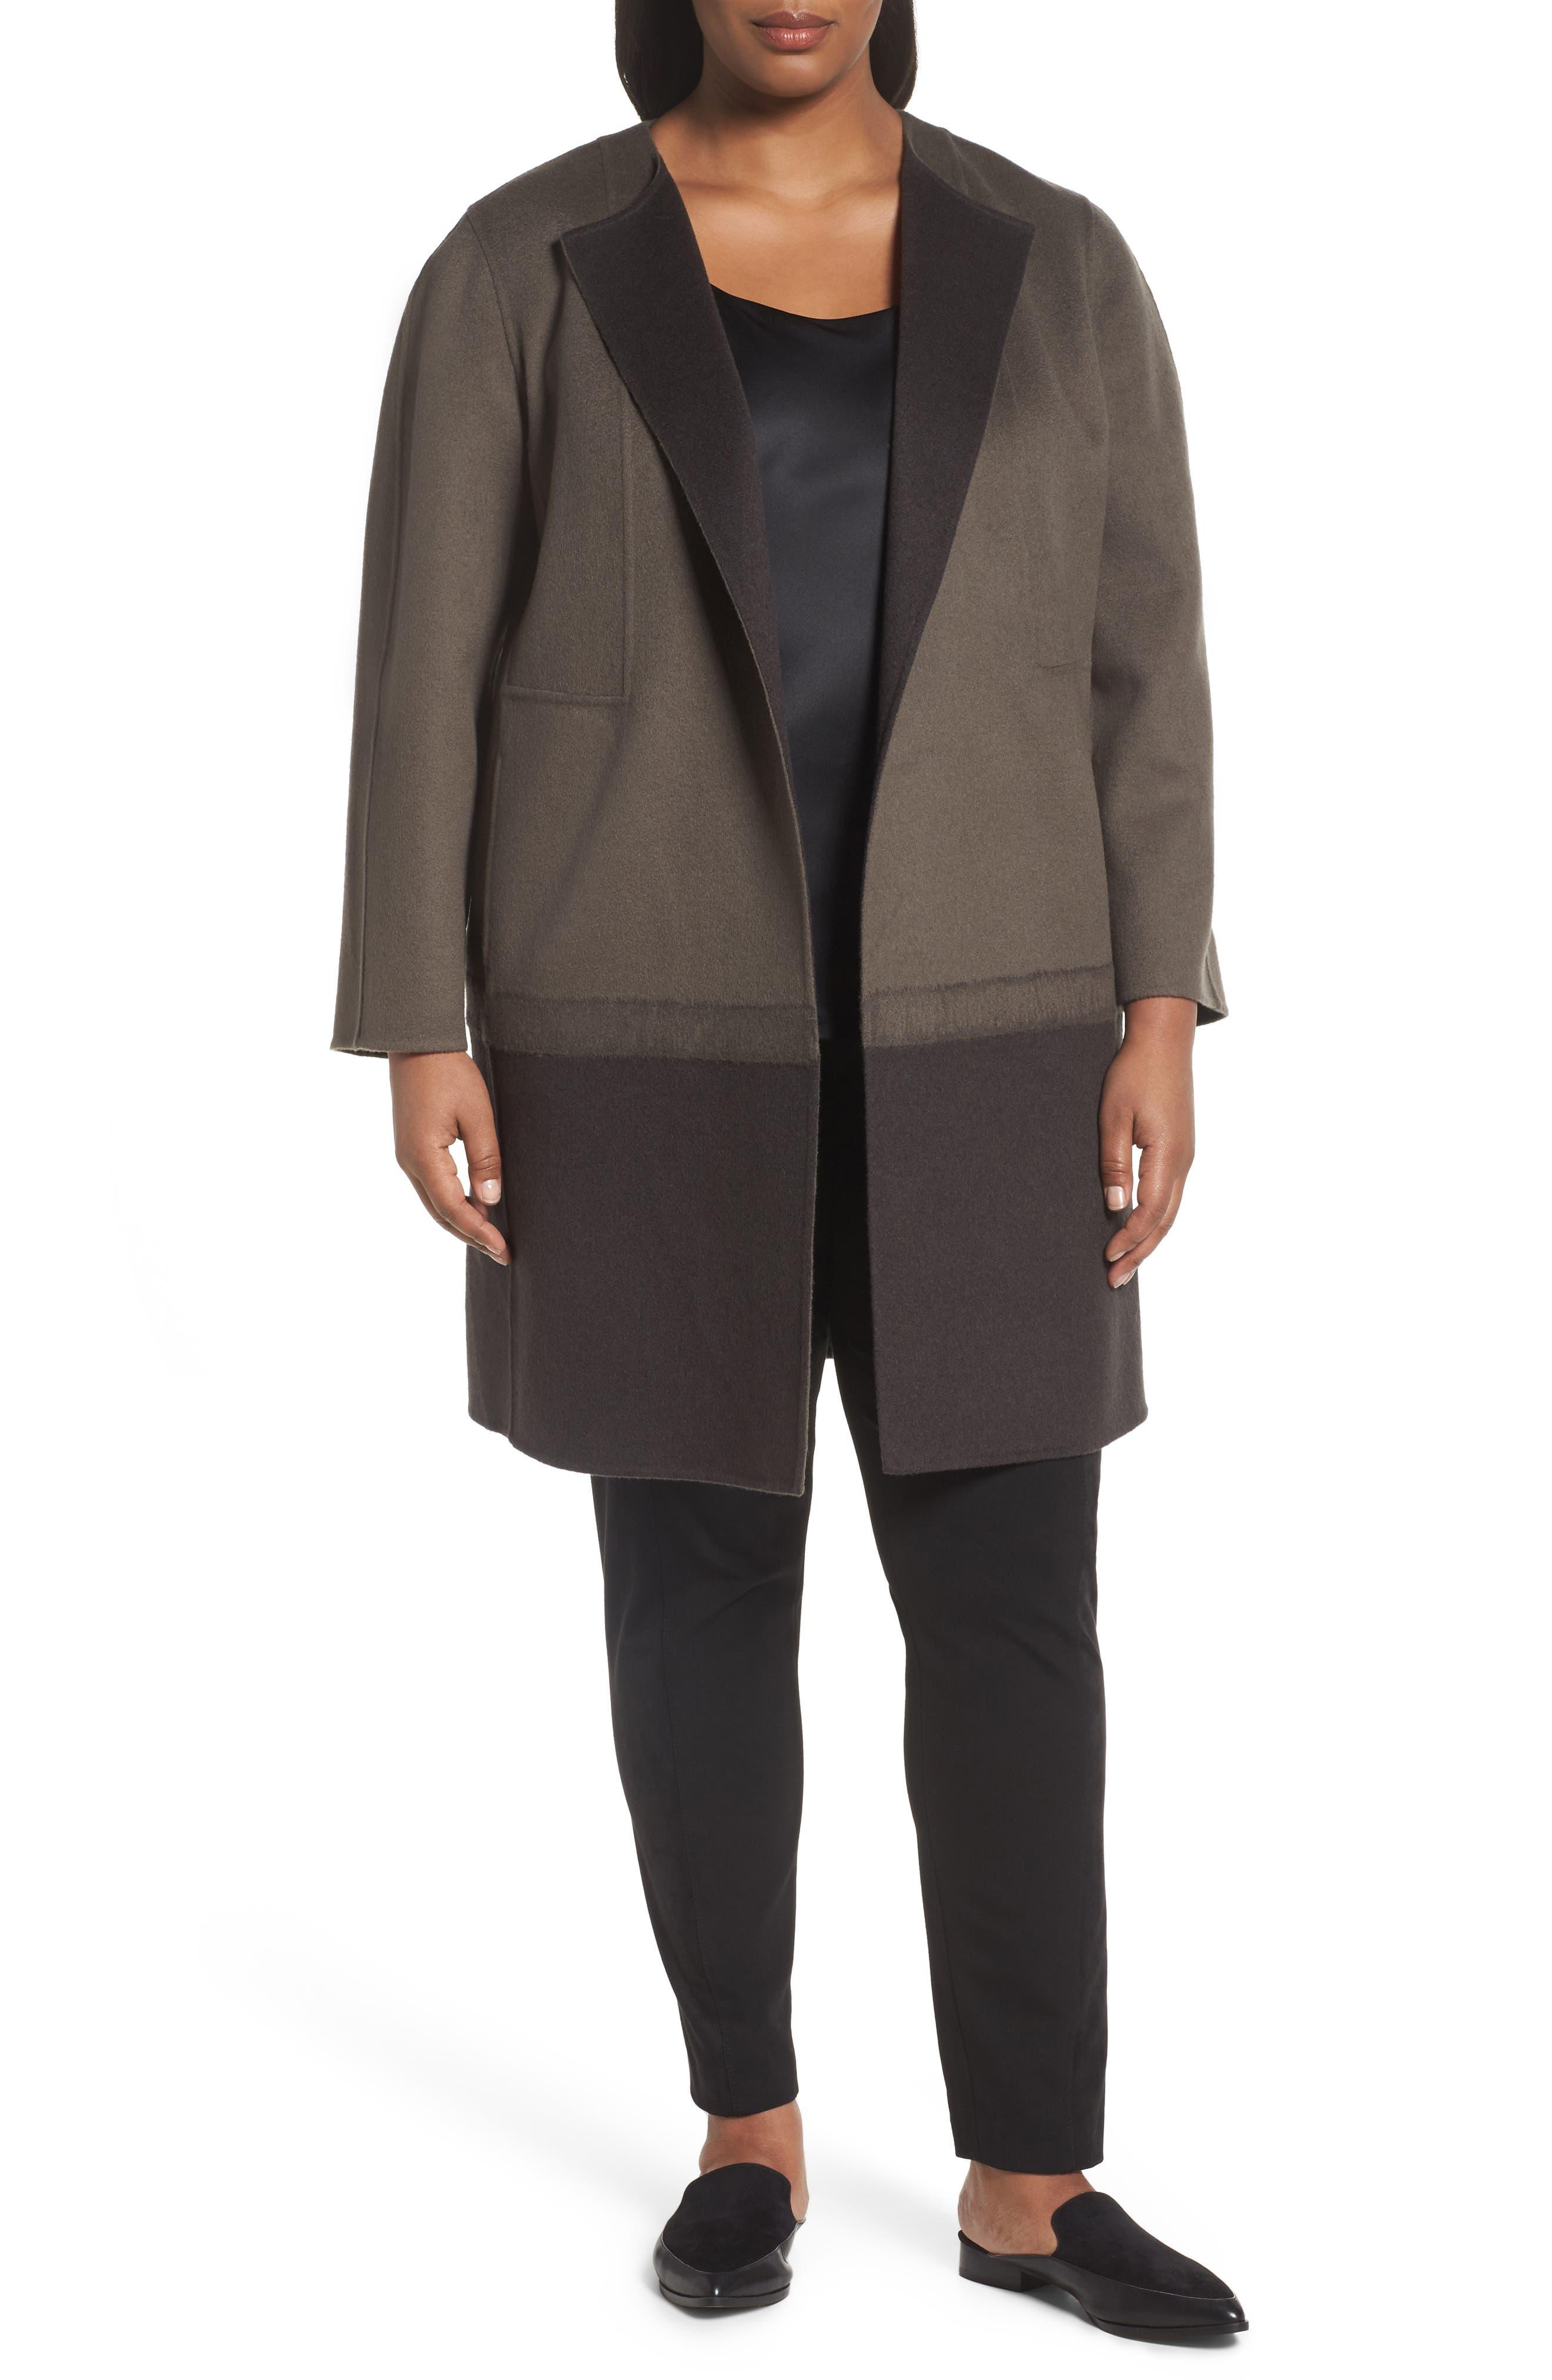 Lafayette 148 New York Hayes Wool & Cashmere Coat (Plus Size)